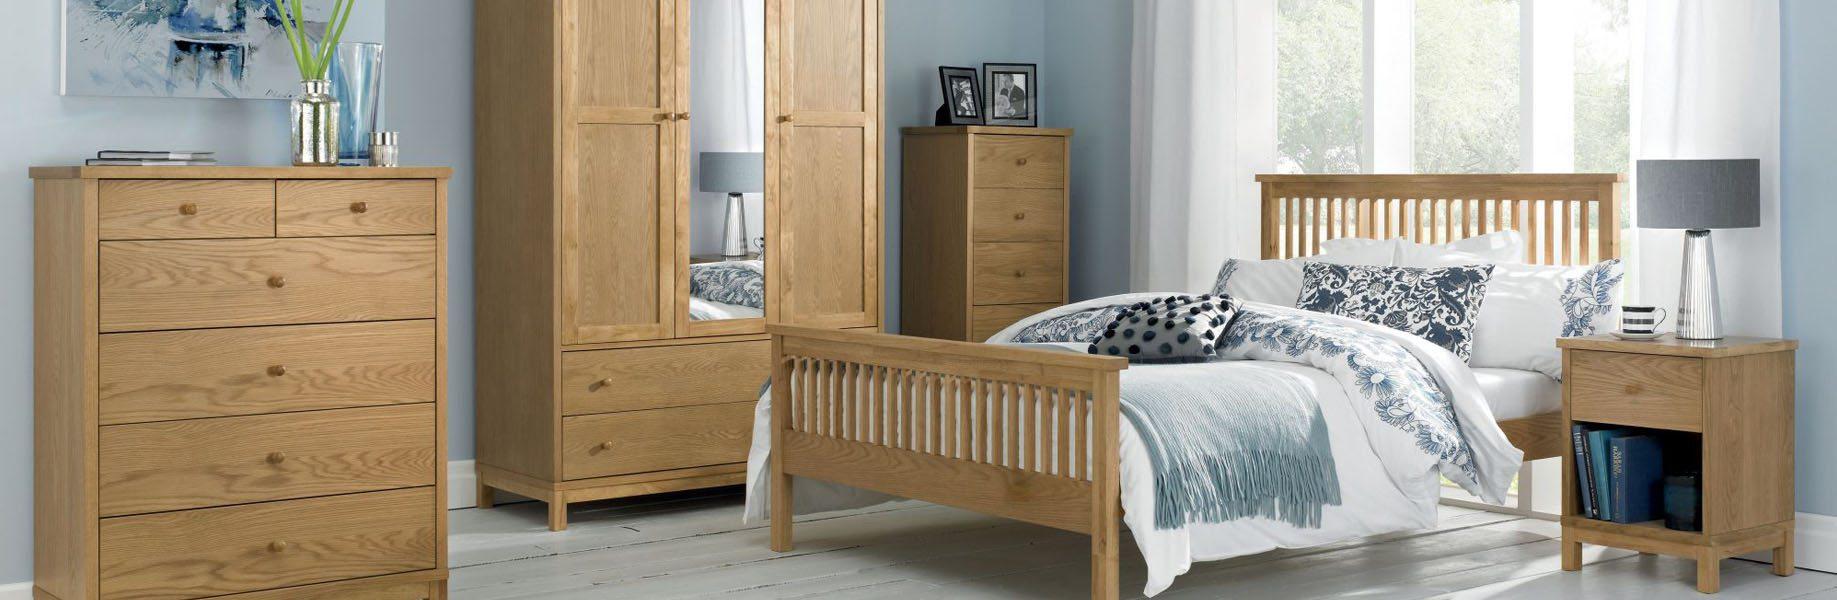 Lyon Oak Bedroom Furniture The Haven Home Interiors Havenfurniturecouk Furniture